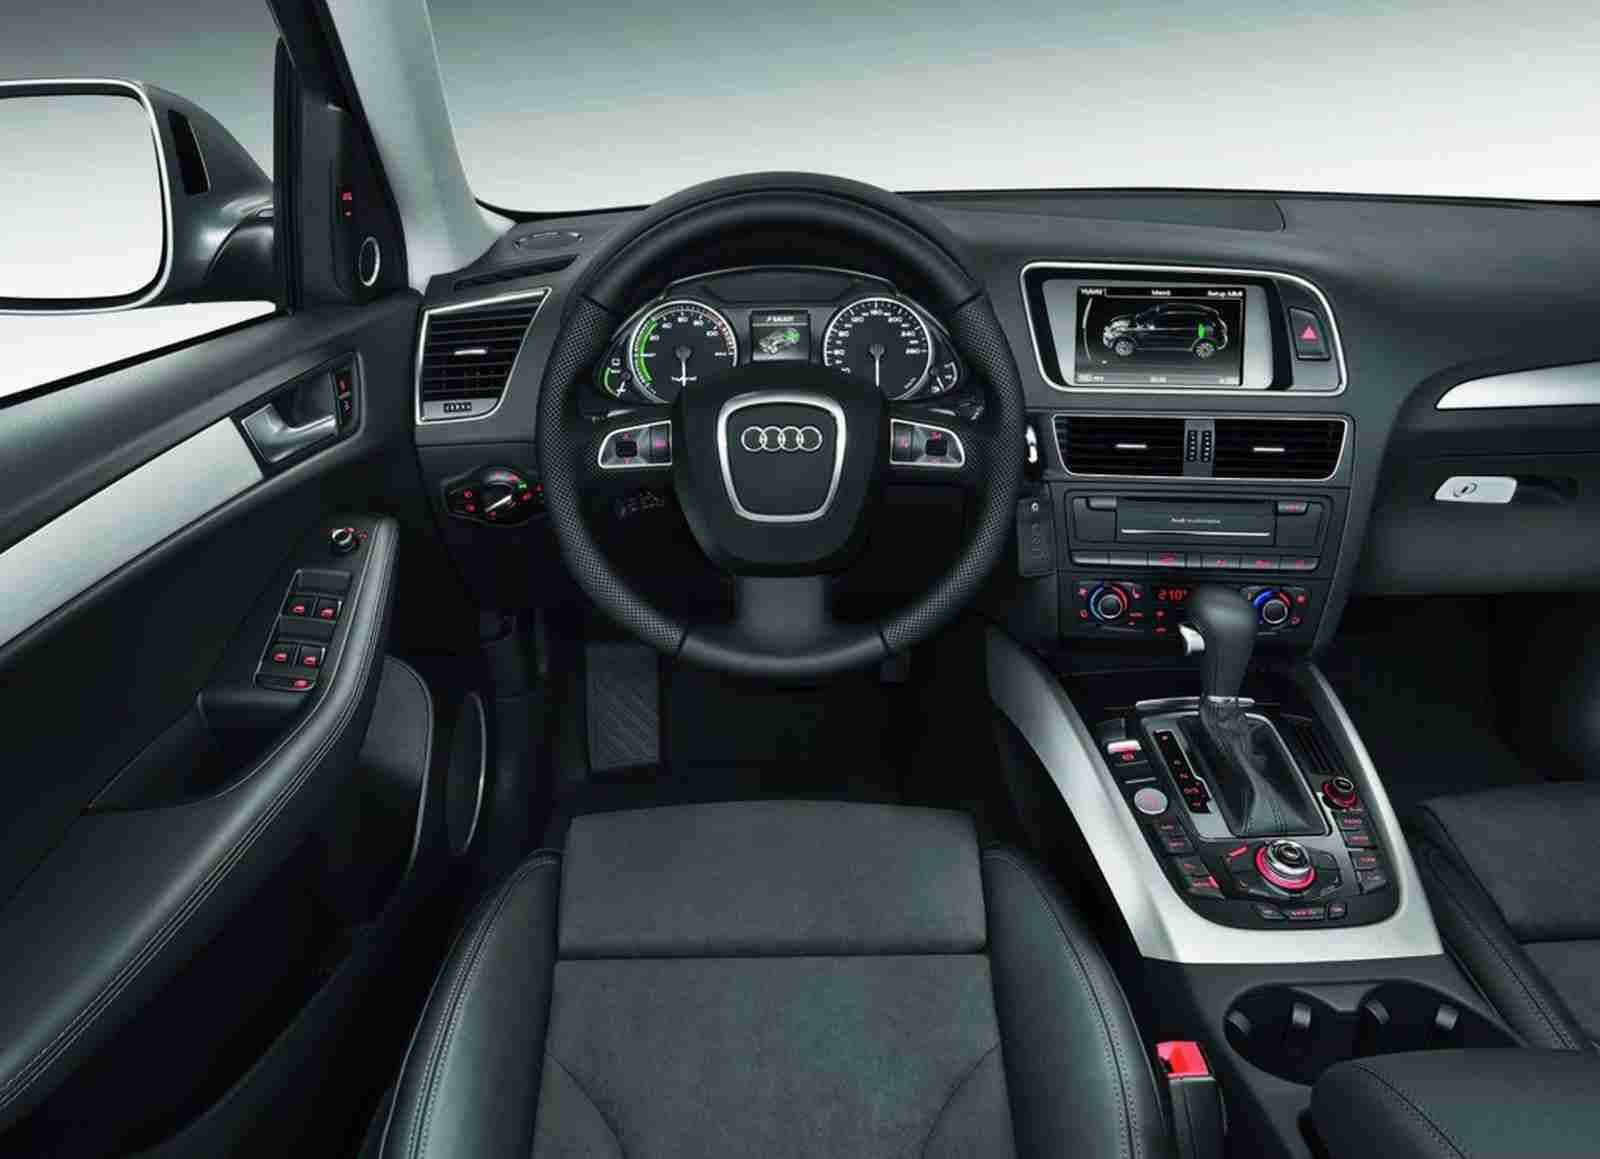 Worksheet. Audi Q5 Hybrid quattro technical details history photos on